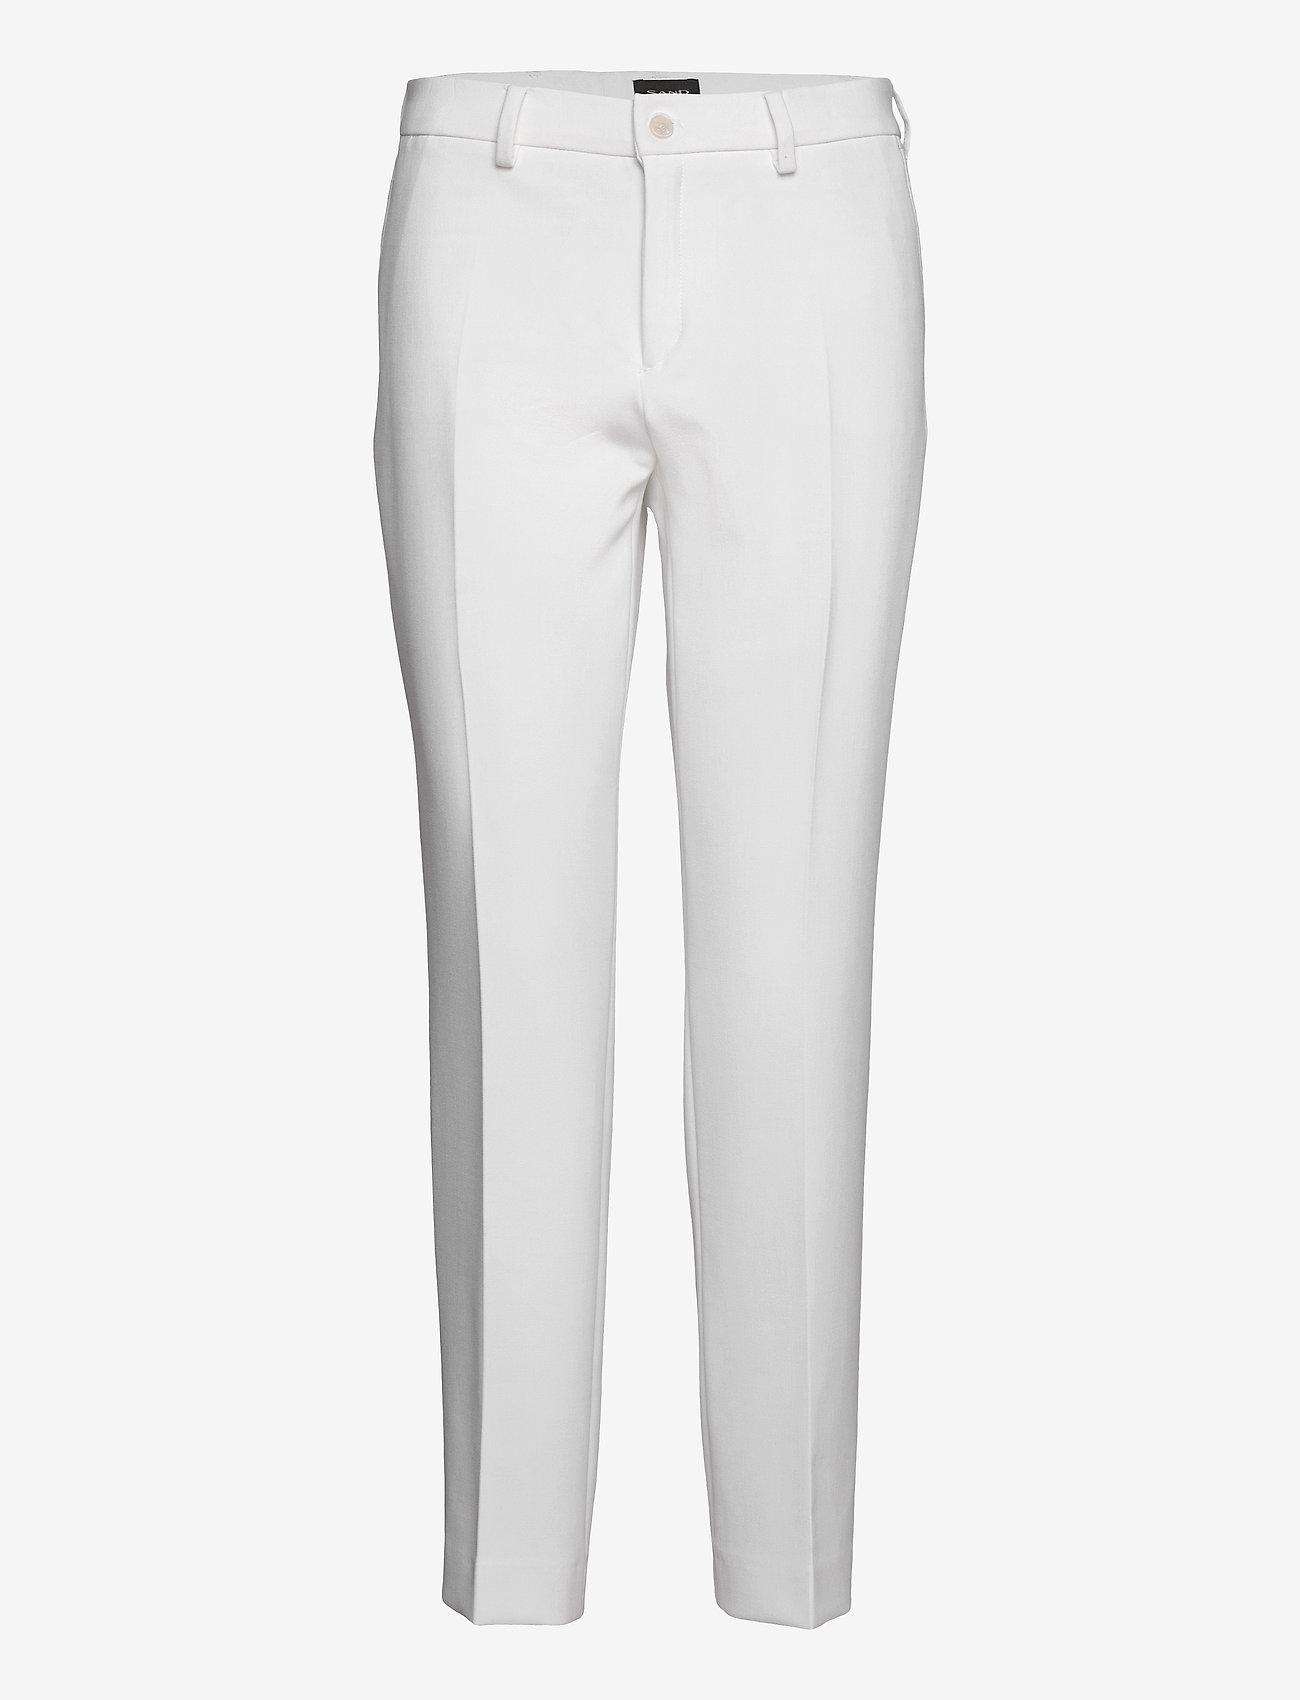 SAND - 3596 - Dori A - broeken med straight ben - optical white - 0